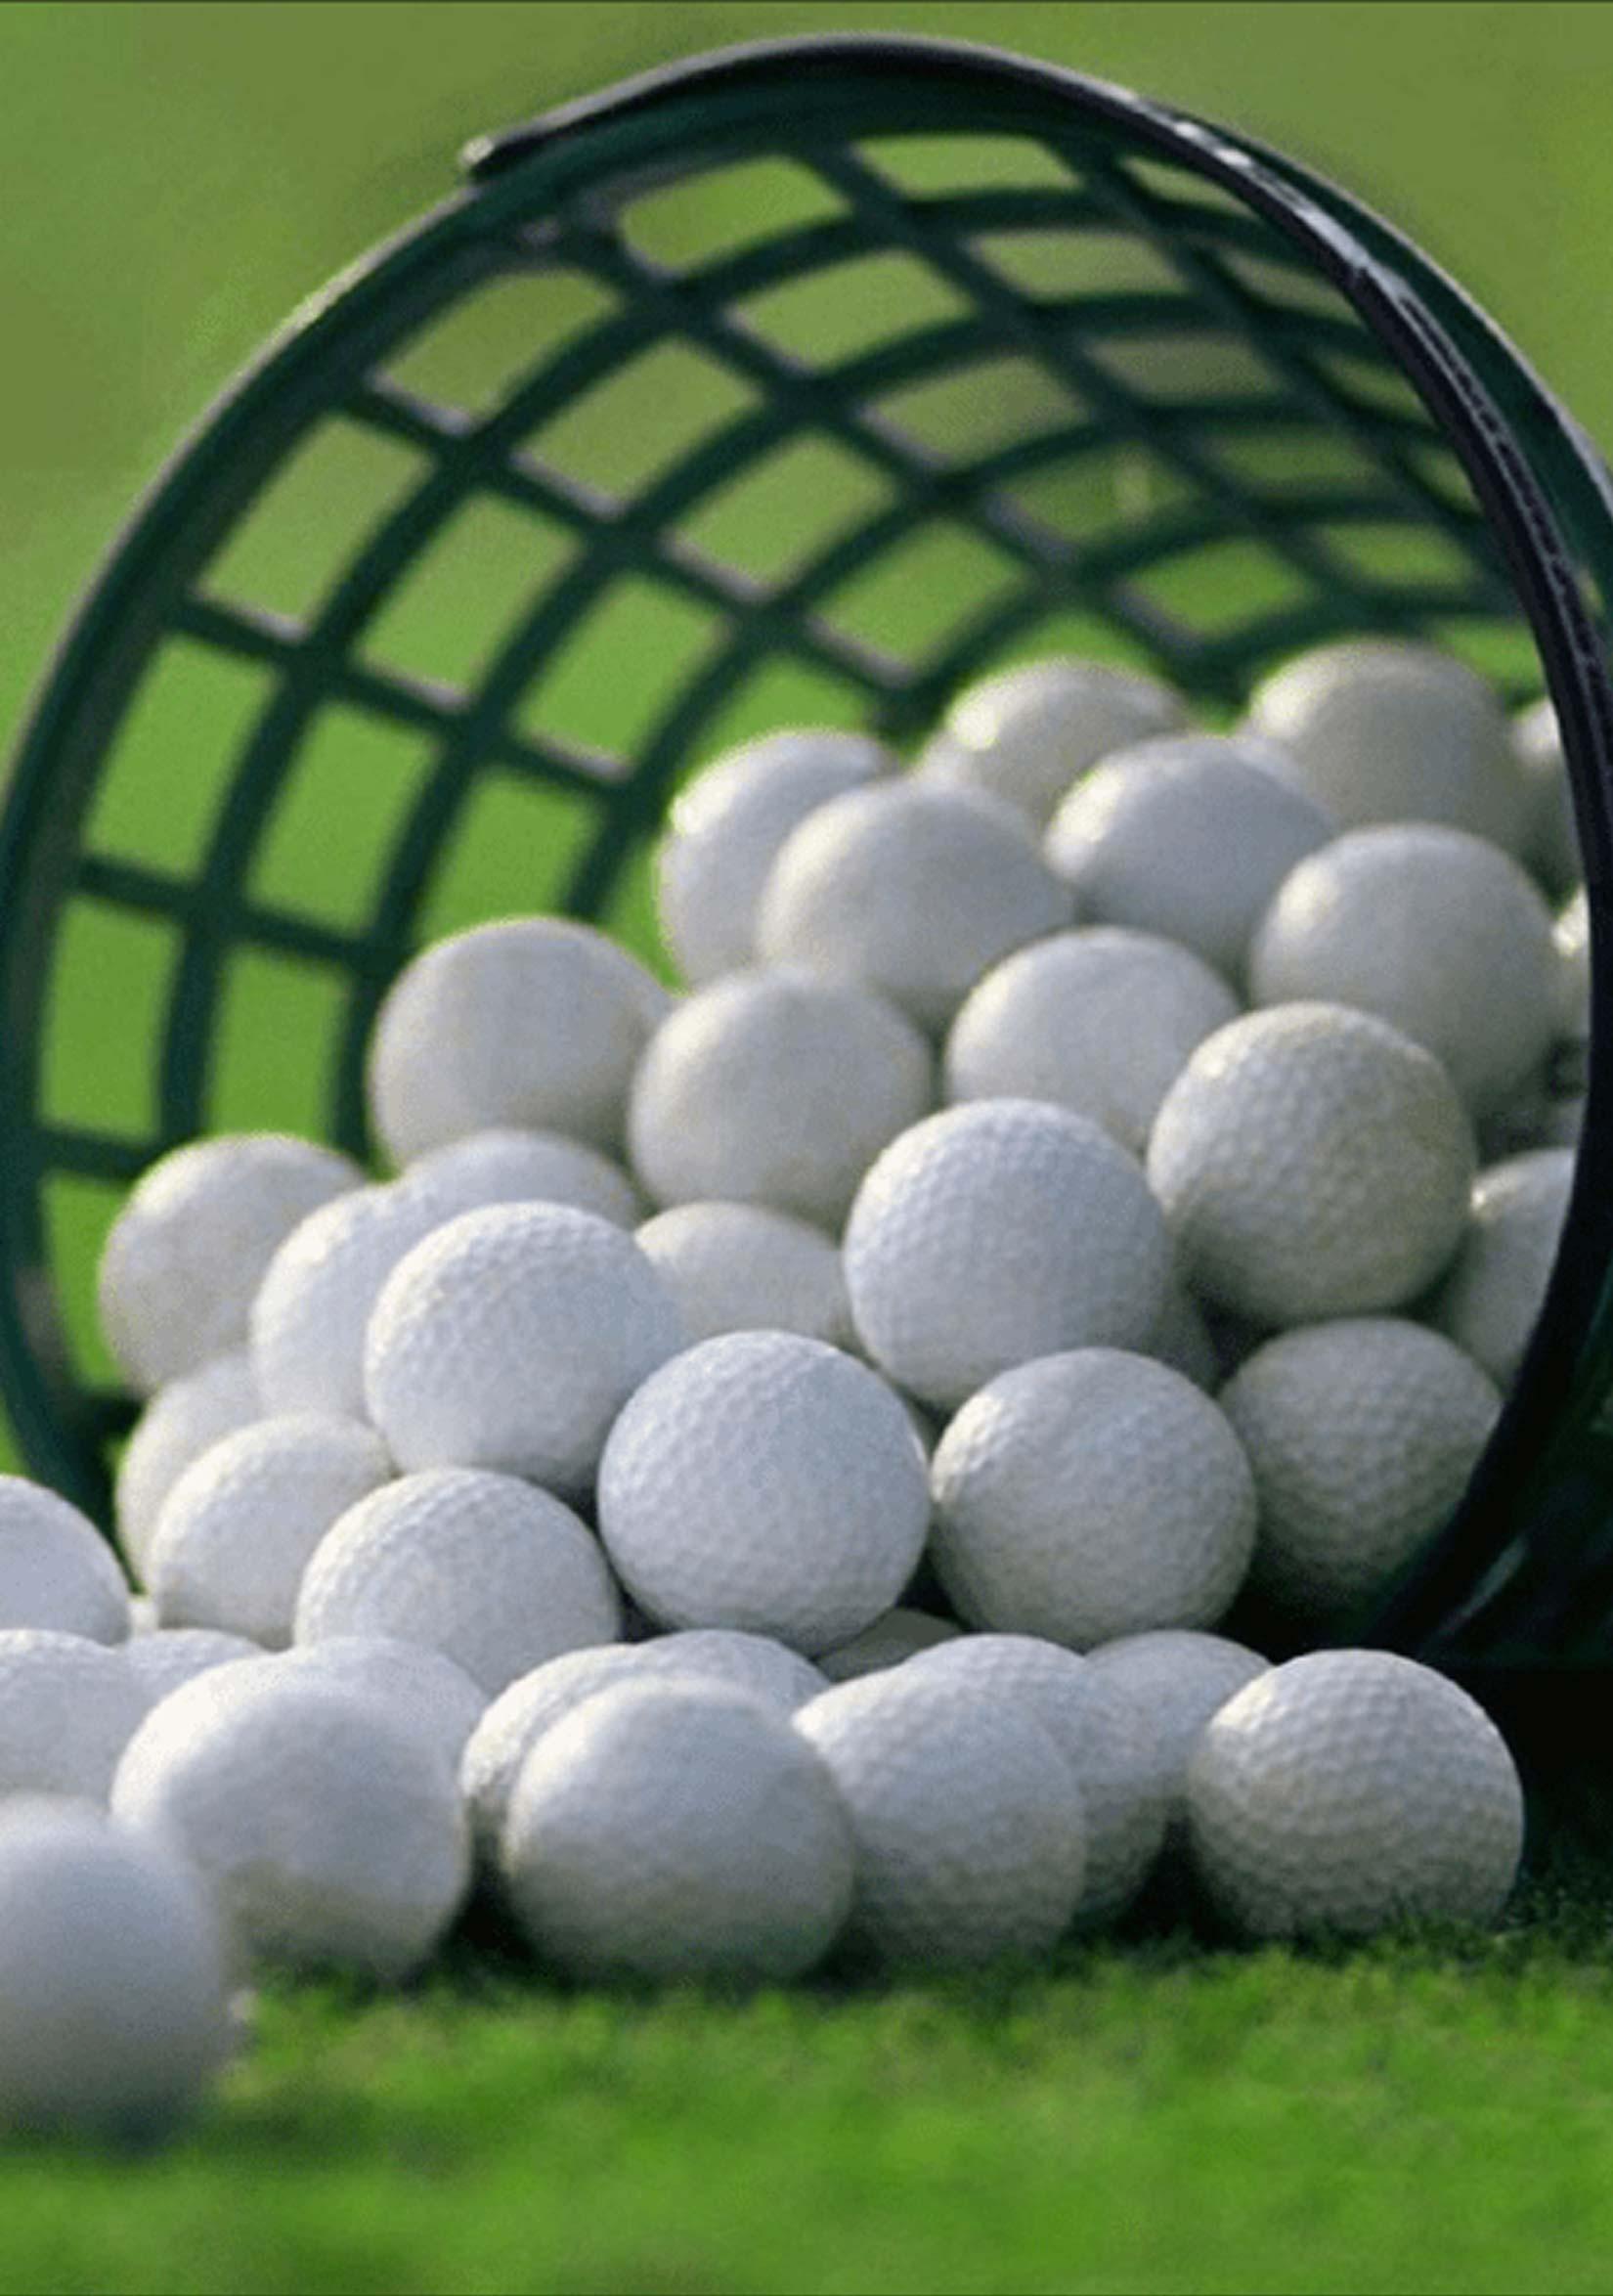 Akebar Golf Balls